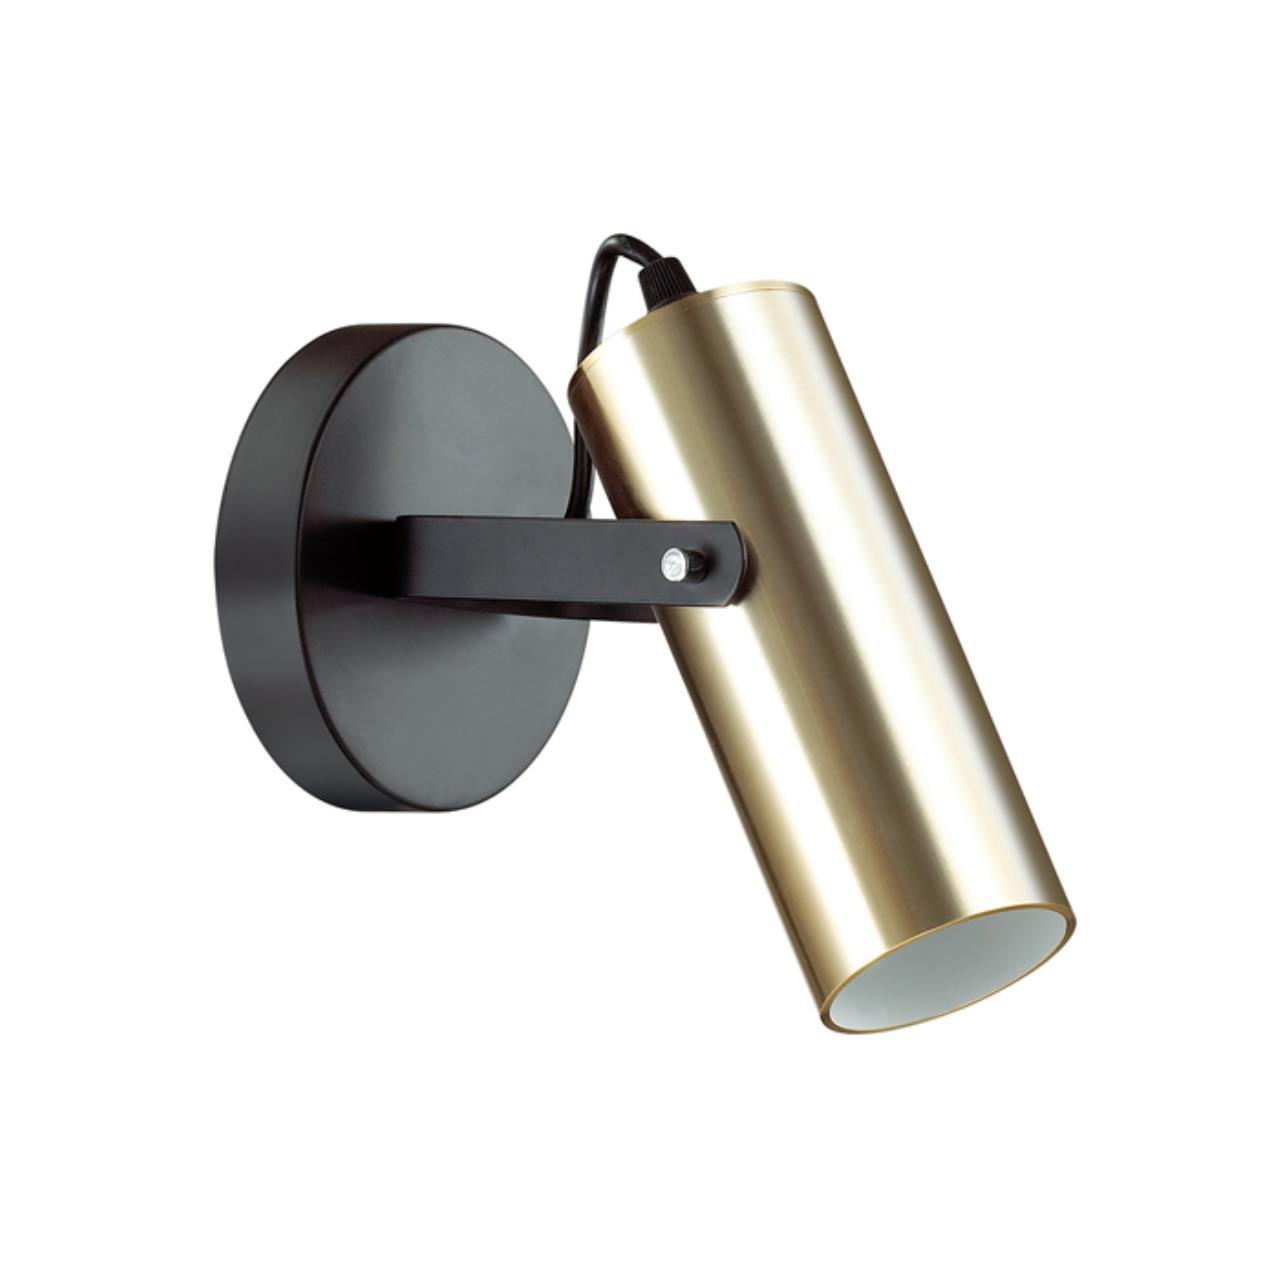 3714/1W MODERNI LN18 90 золотой, чёрный Бра GU10 5W 220V CLAIRE